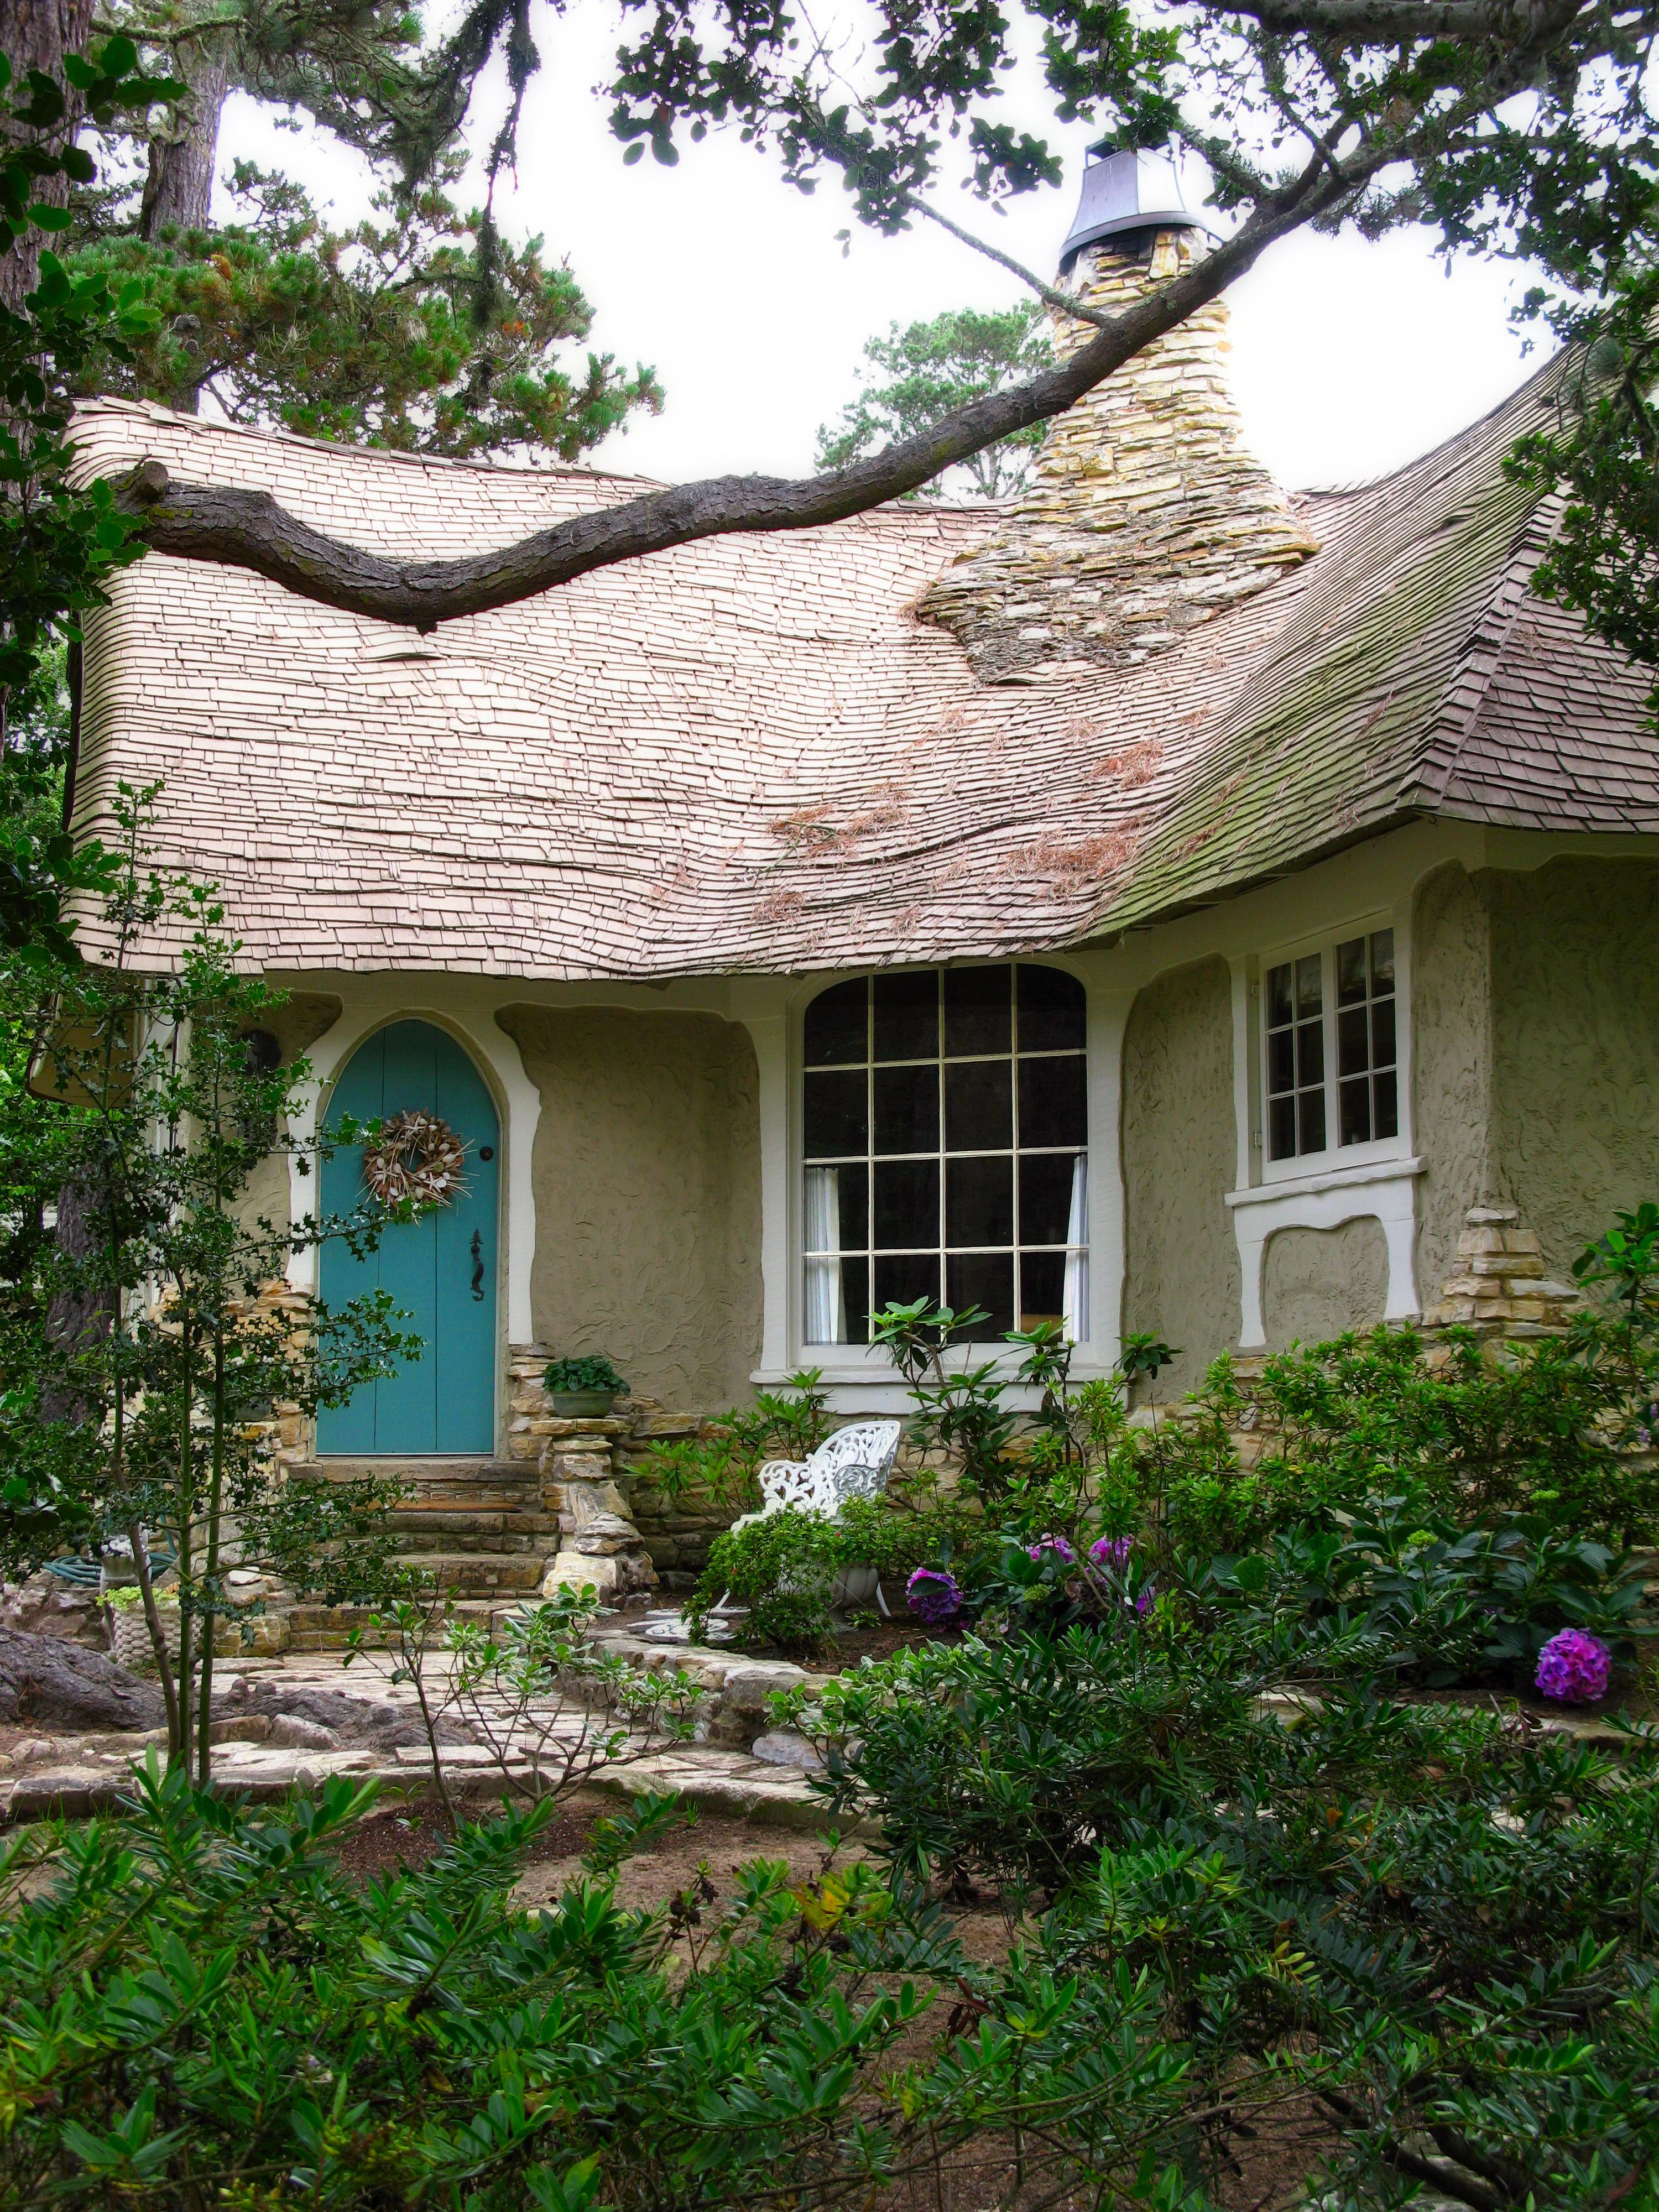 Hugh Comstock S Marchen Haus A Fairytale Cottage Once